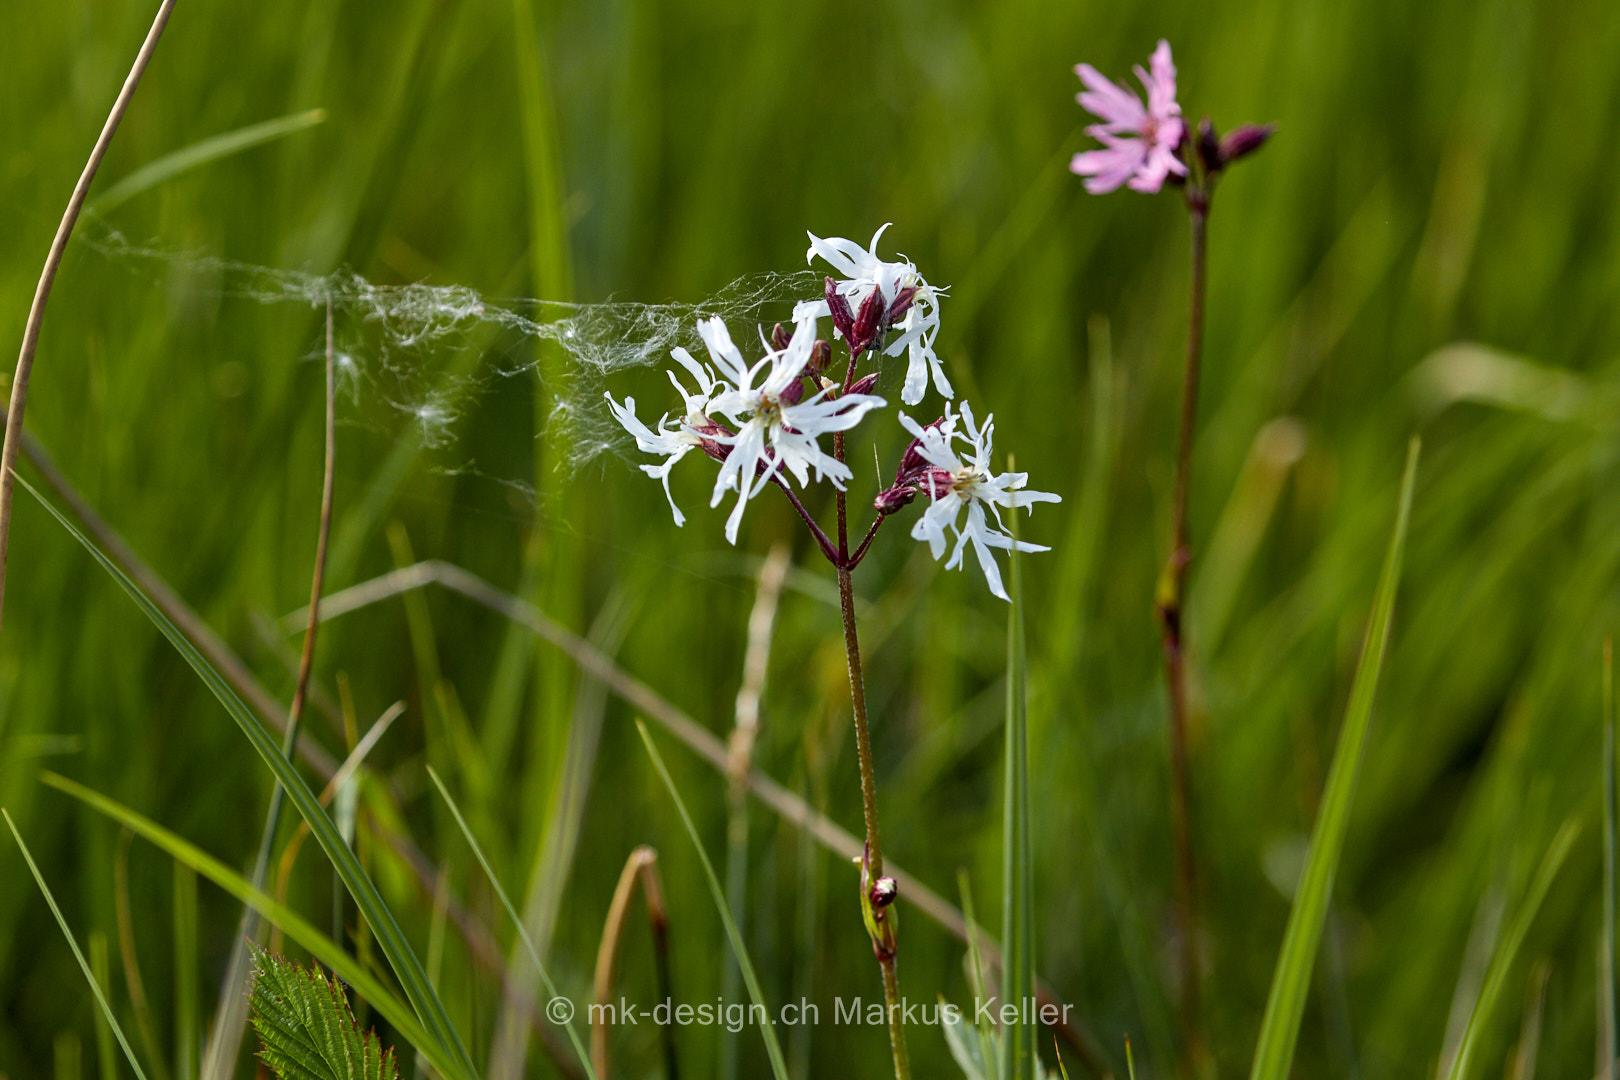 Pflanze   Blume   Kuckucks-Lichtnelke